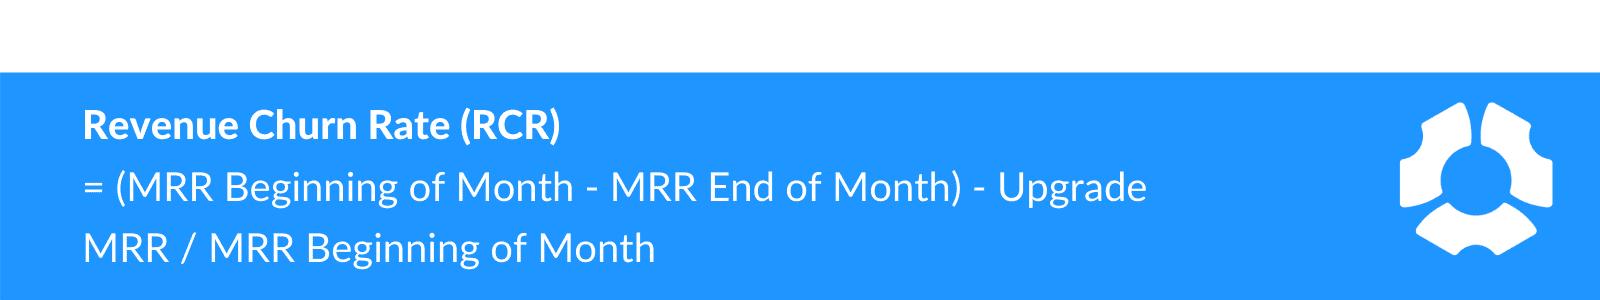 Revenue churn rate (RCR) formula